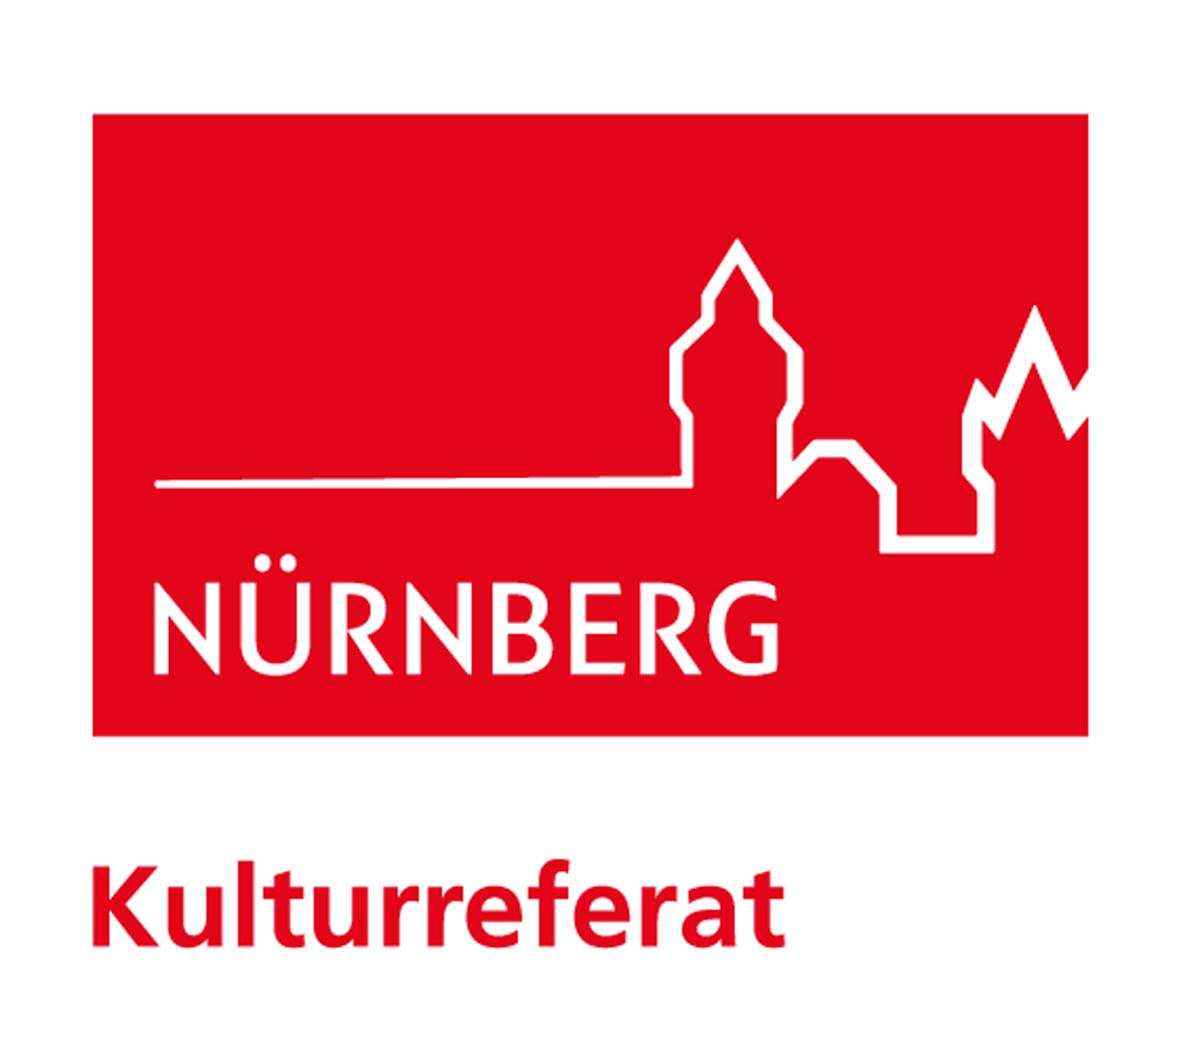 StN_Kulturreferat_4C_vertikal.jpg